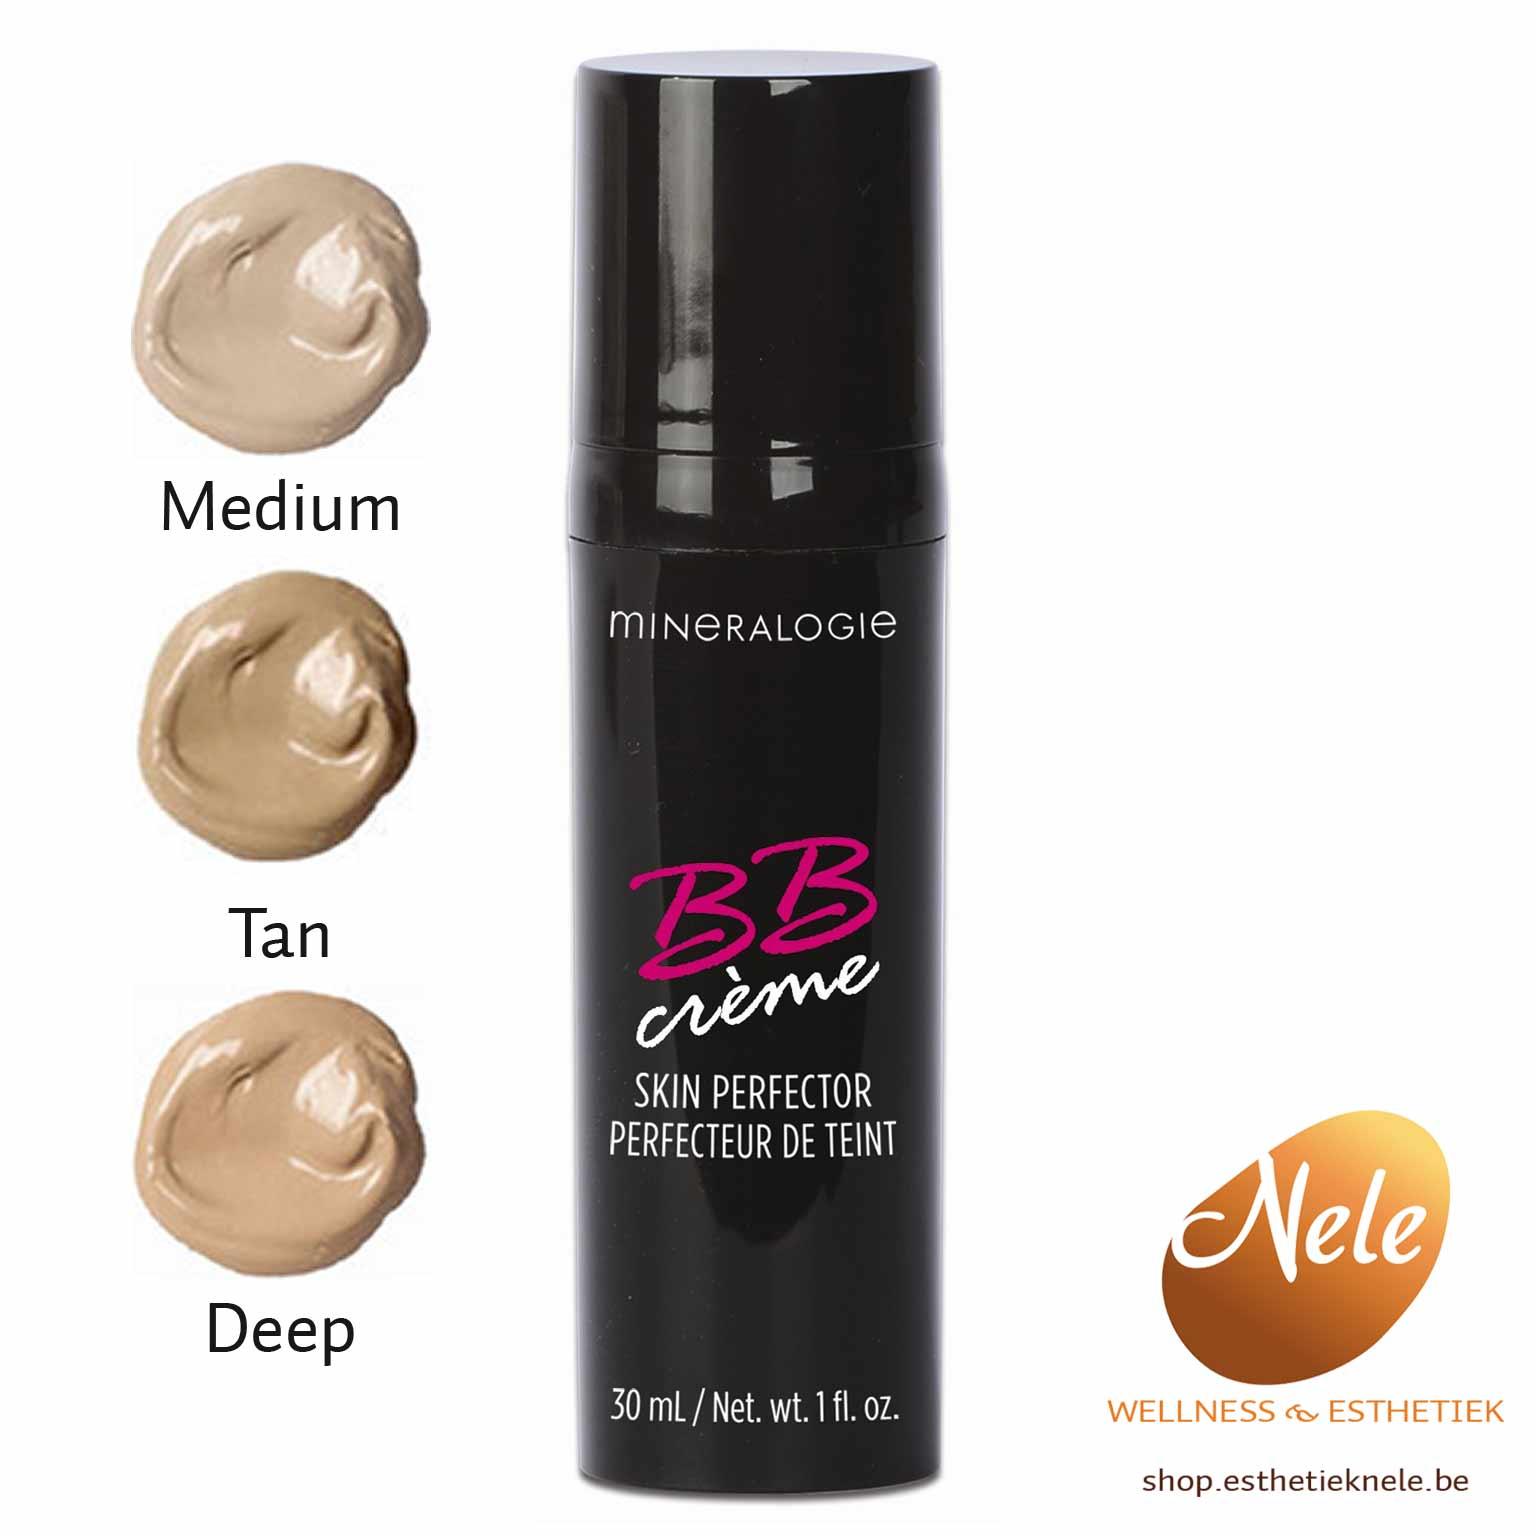 Mineralogie Mineral BB Cream Crème Wellness Esthetiek Nele